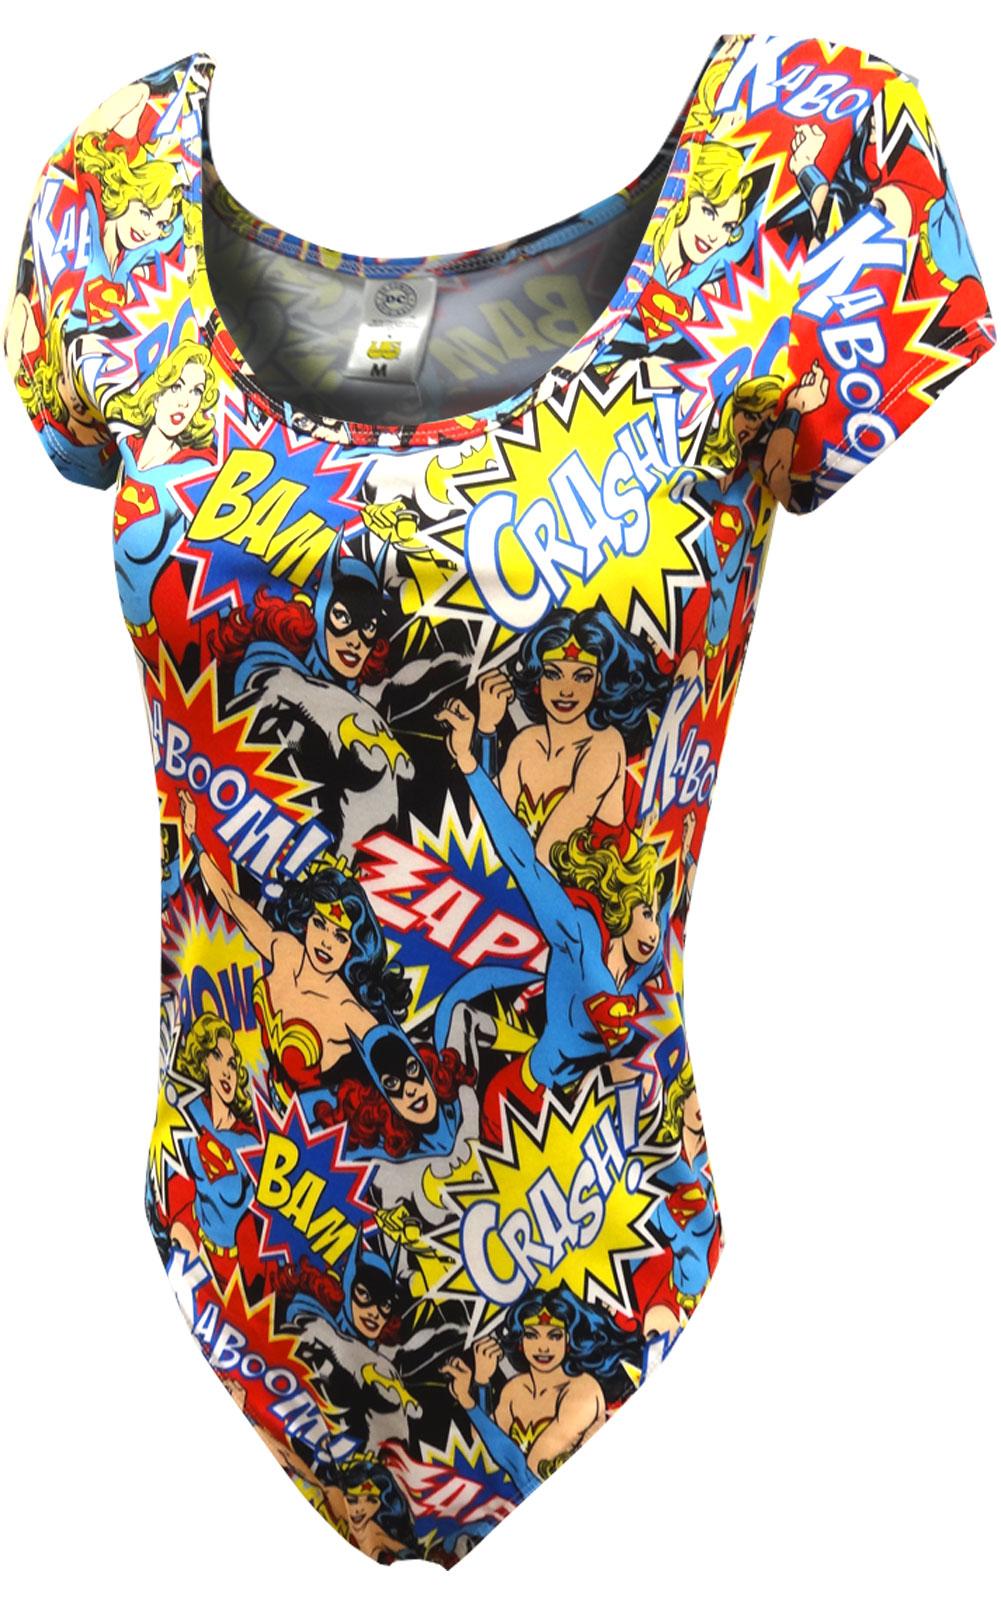 Image of Batgirl Supergirl and Wonder Woman Bodysuit for women